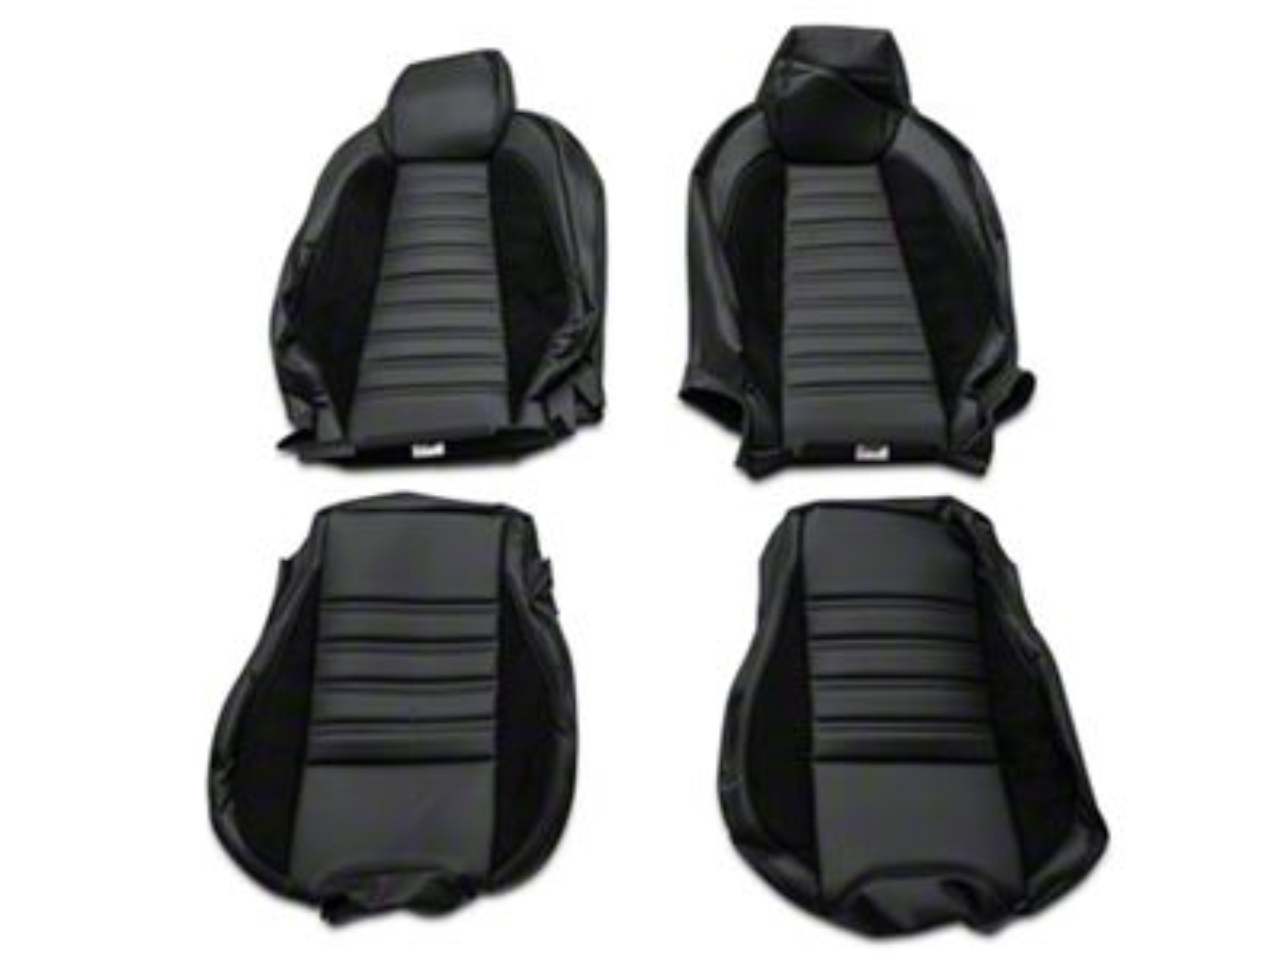 Sport R Full Seat Upholstery & Front Bucket Foam - Black (15-19 Fastback)